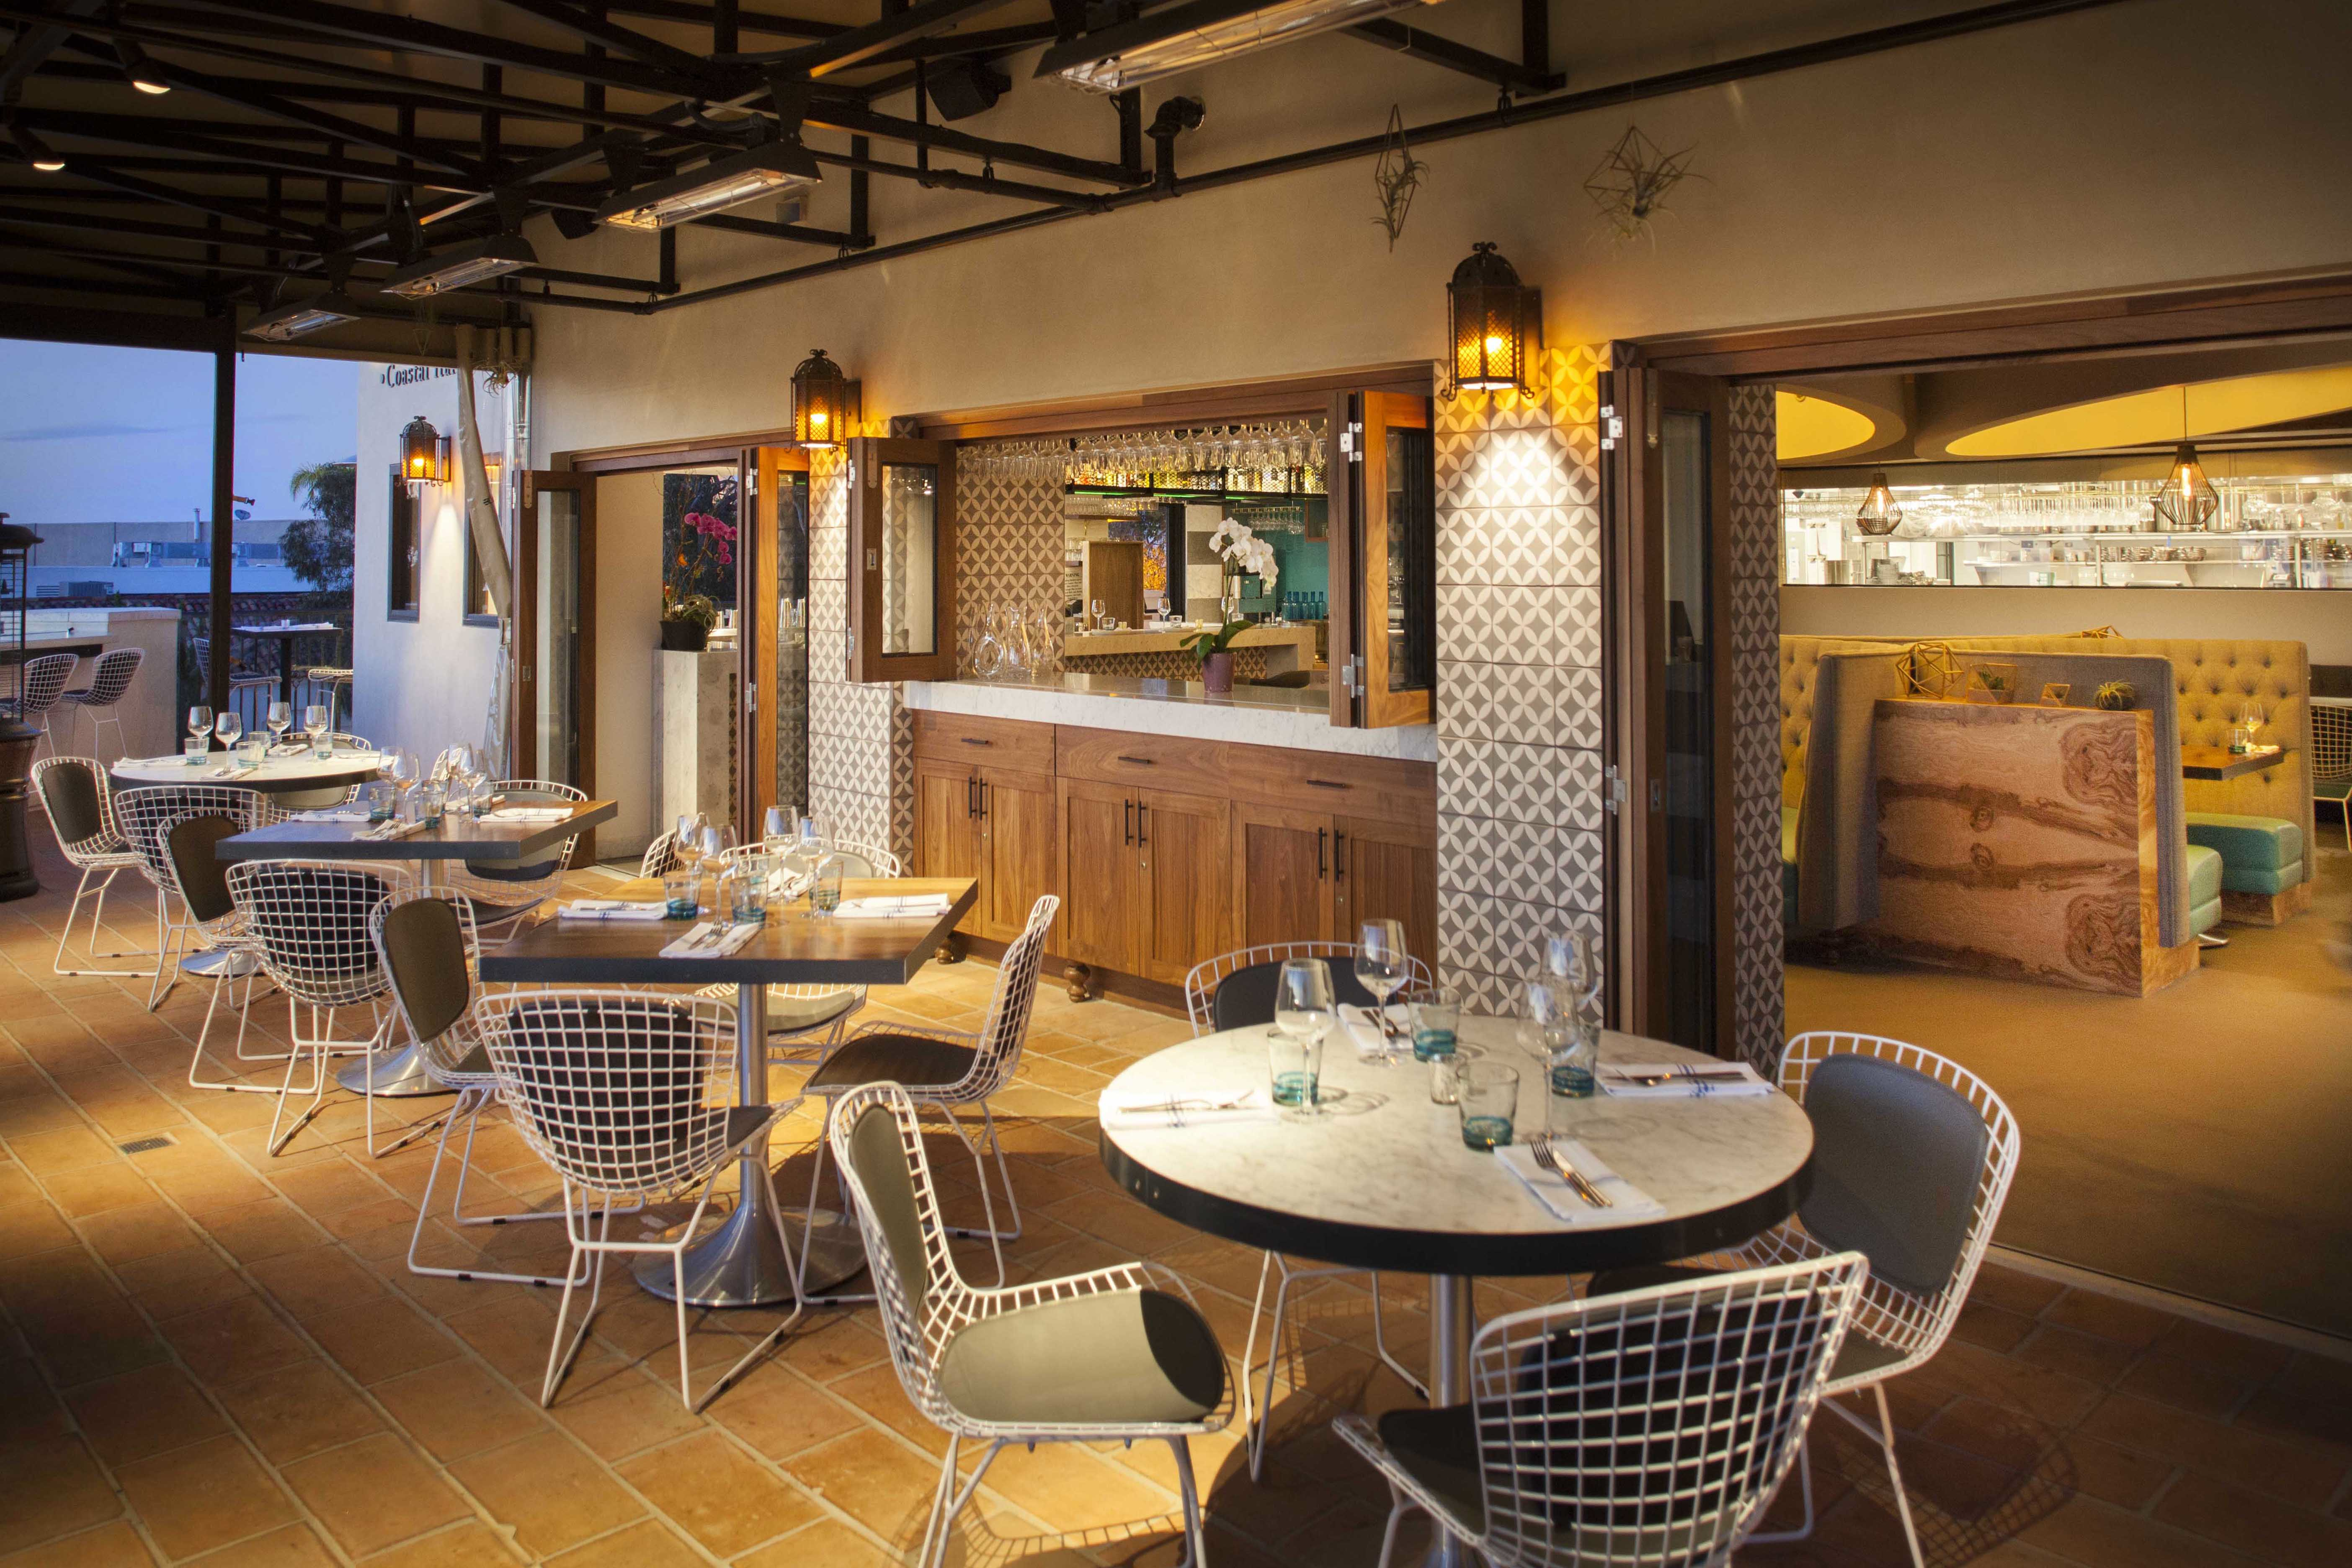 Catania Restaurant Patio La Jolla Tales Of A Ranting Ginger